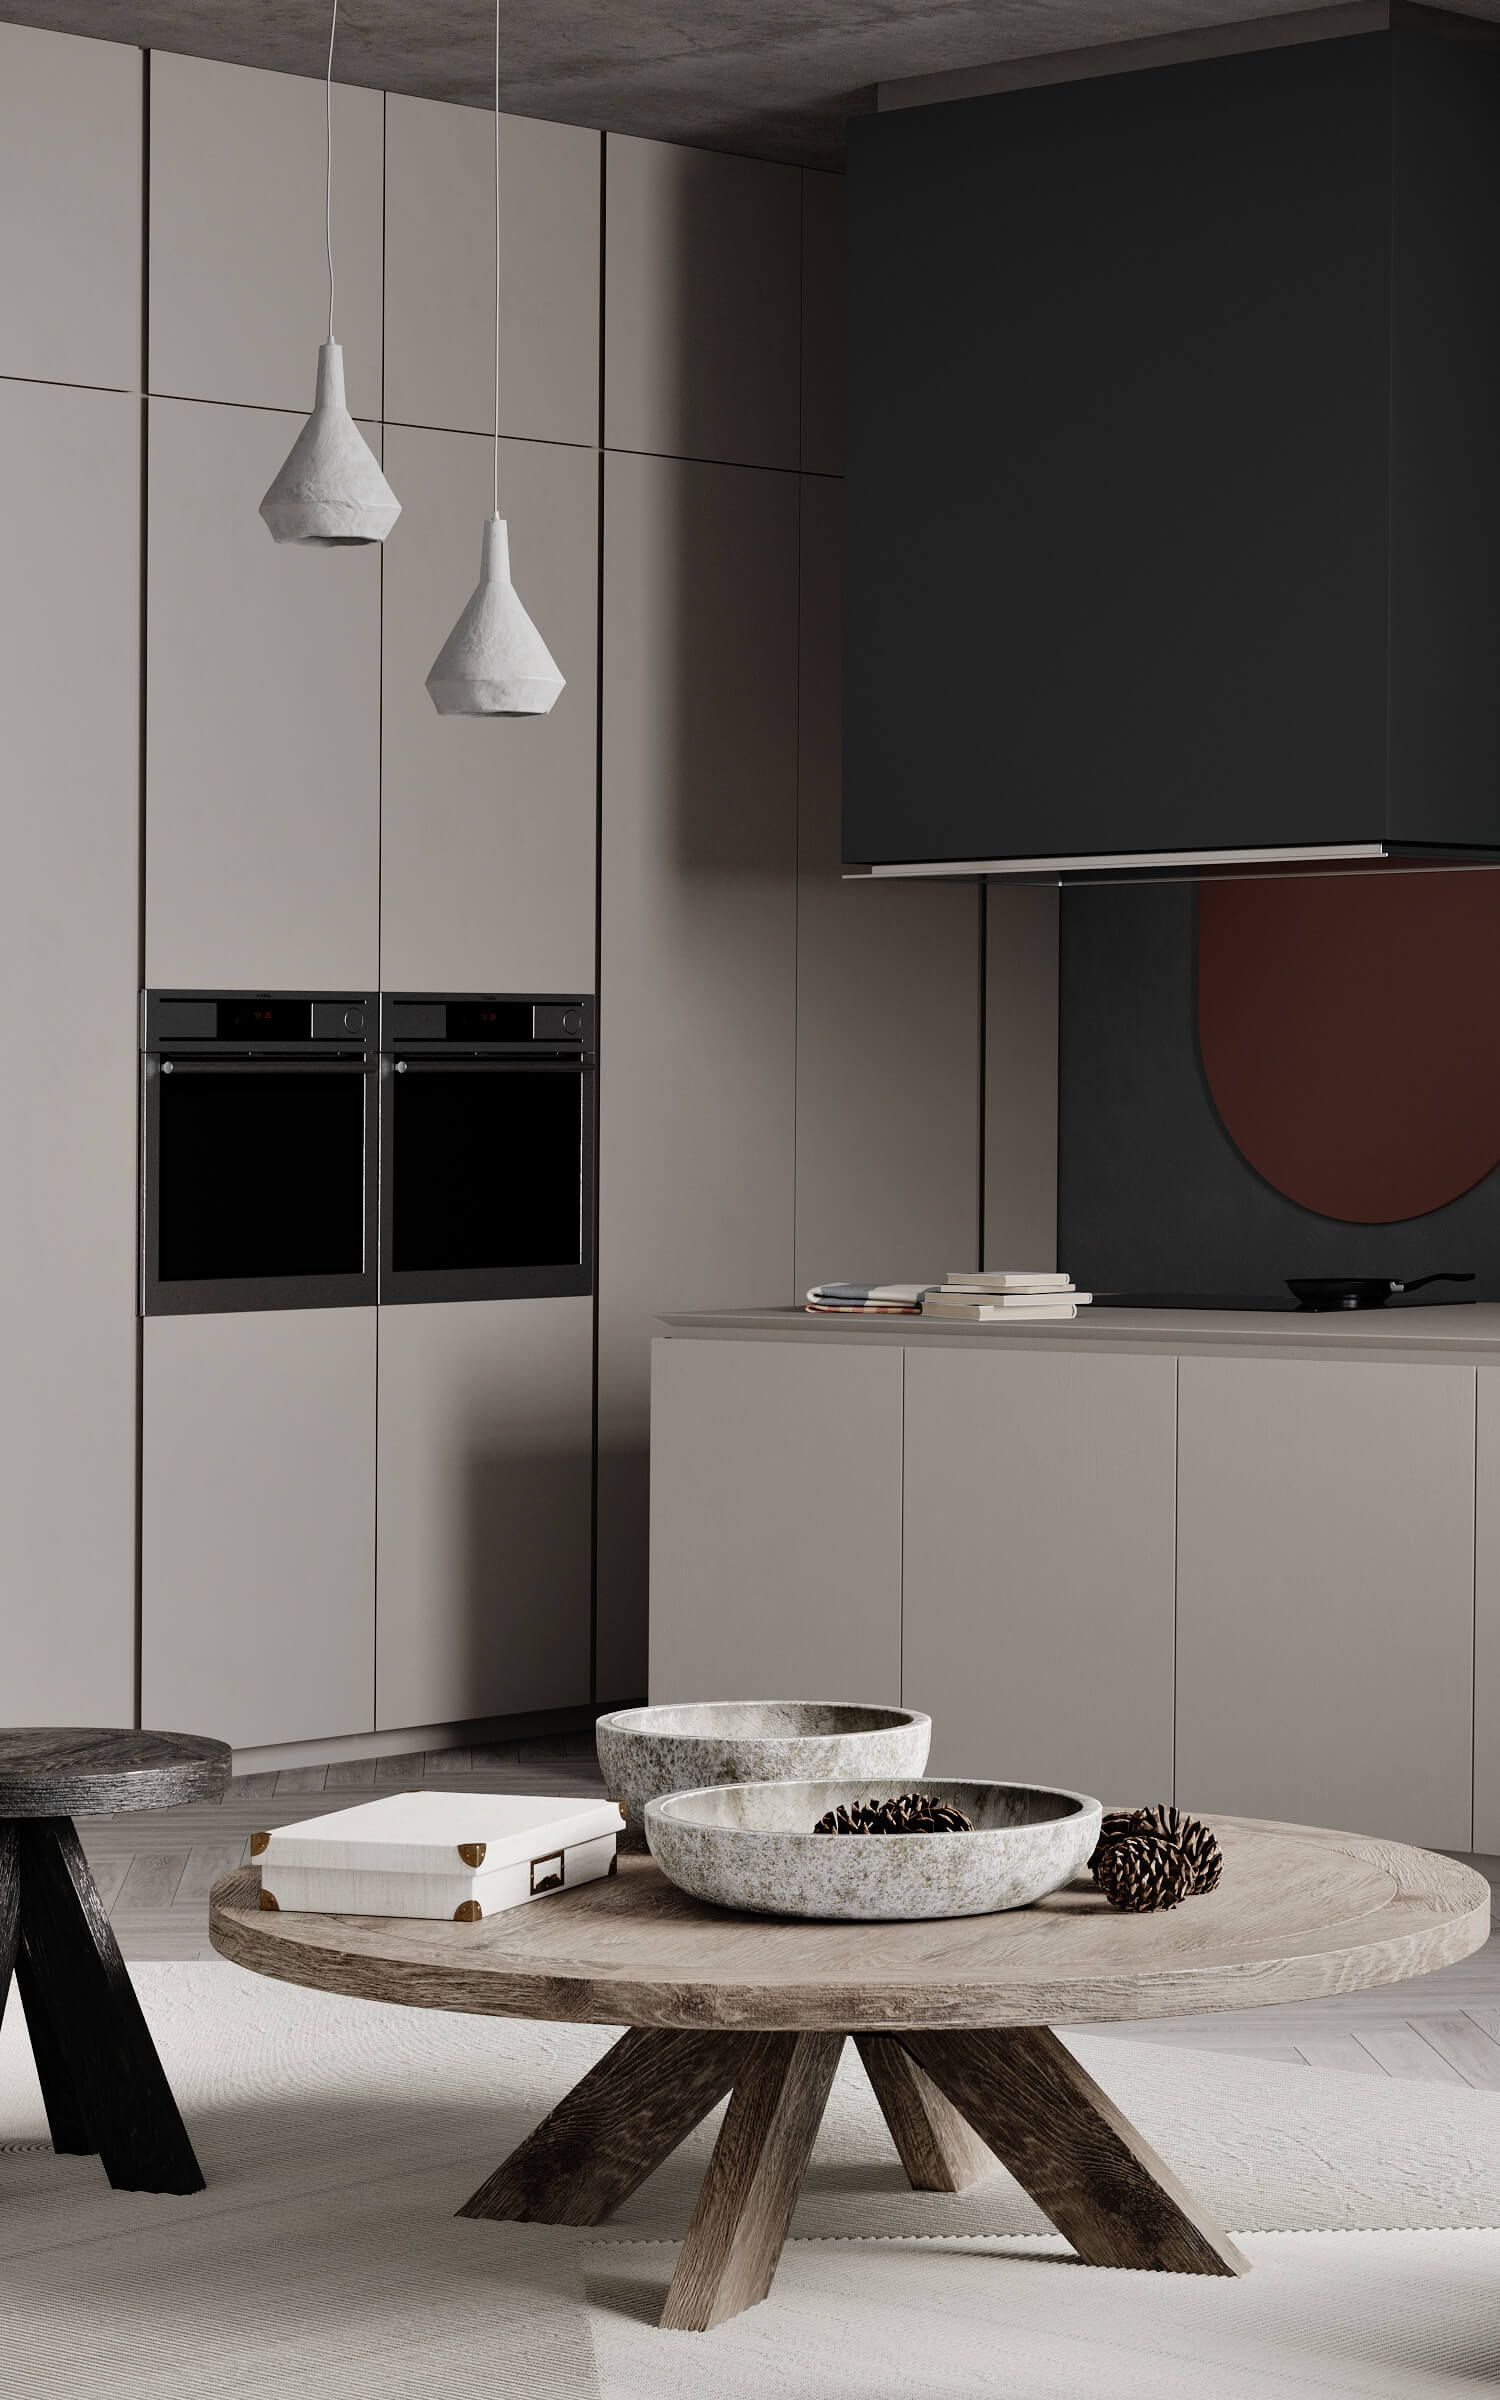 Autodesk Room Design: Trendy Living Apartment // Cgi Visualization In 2020